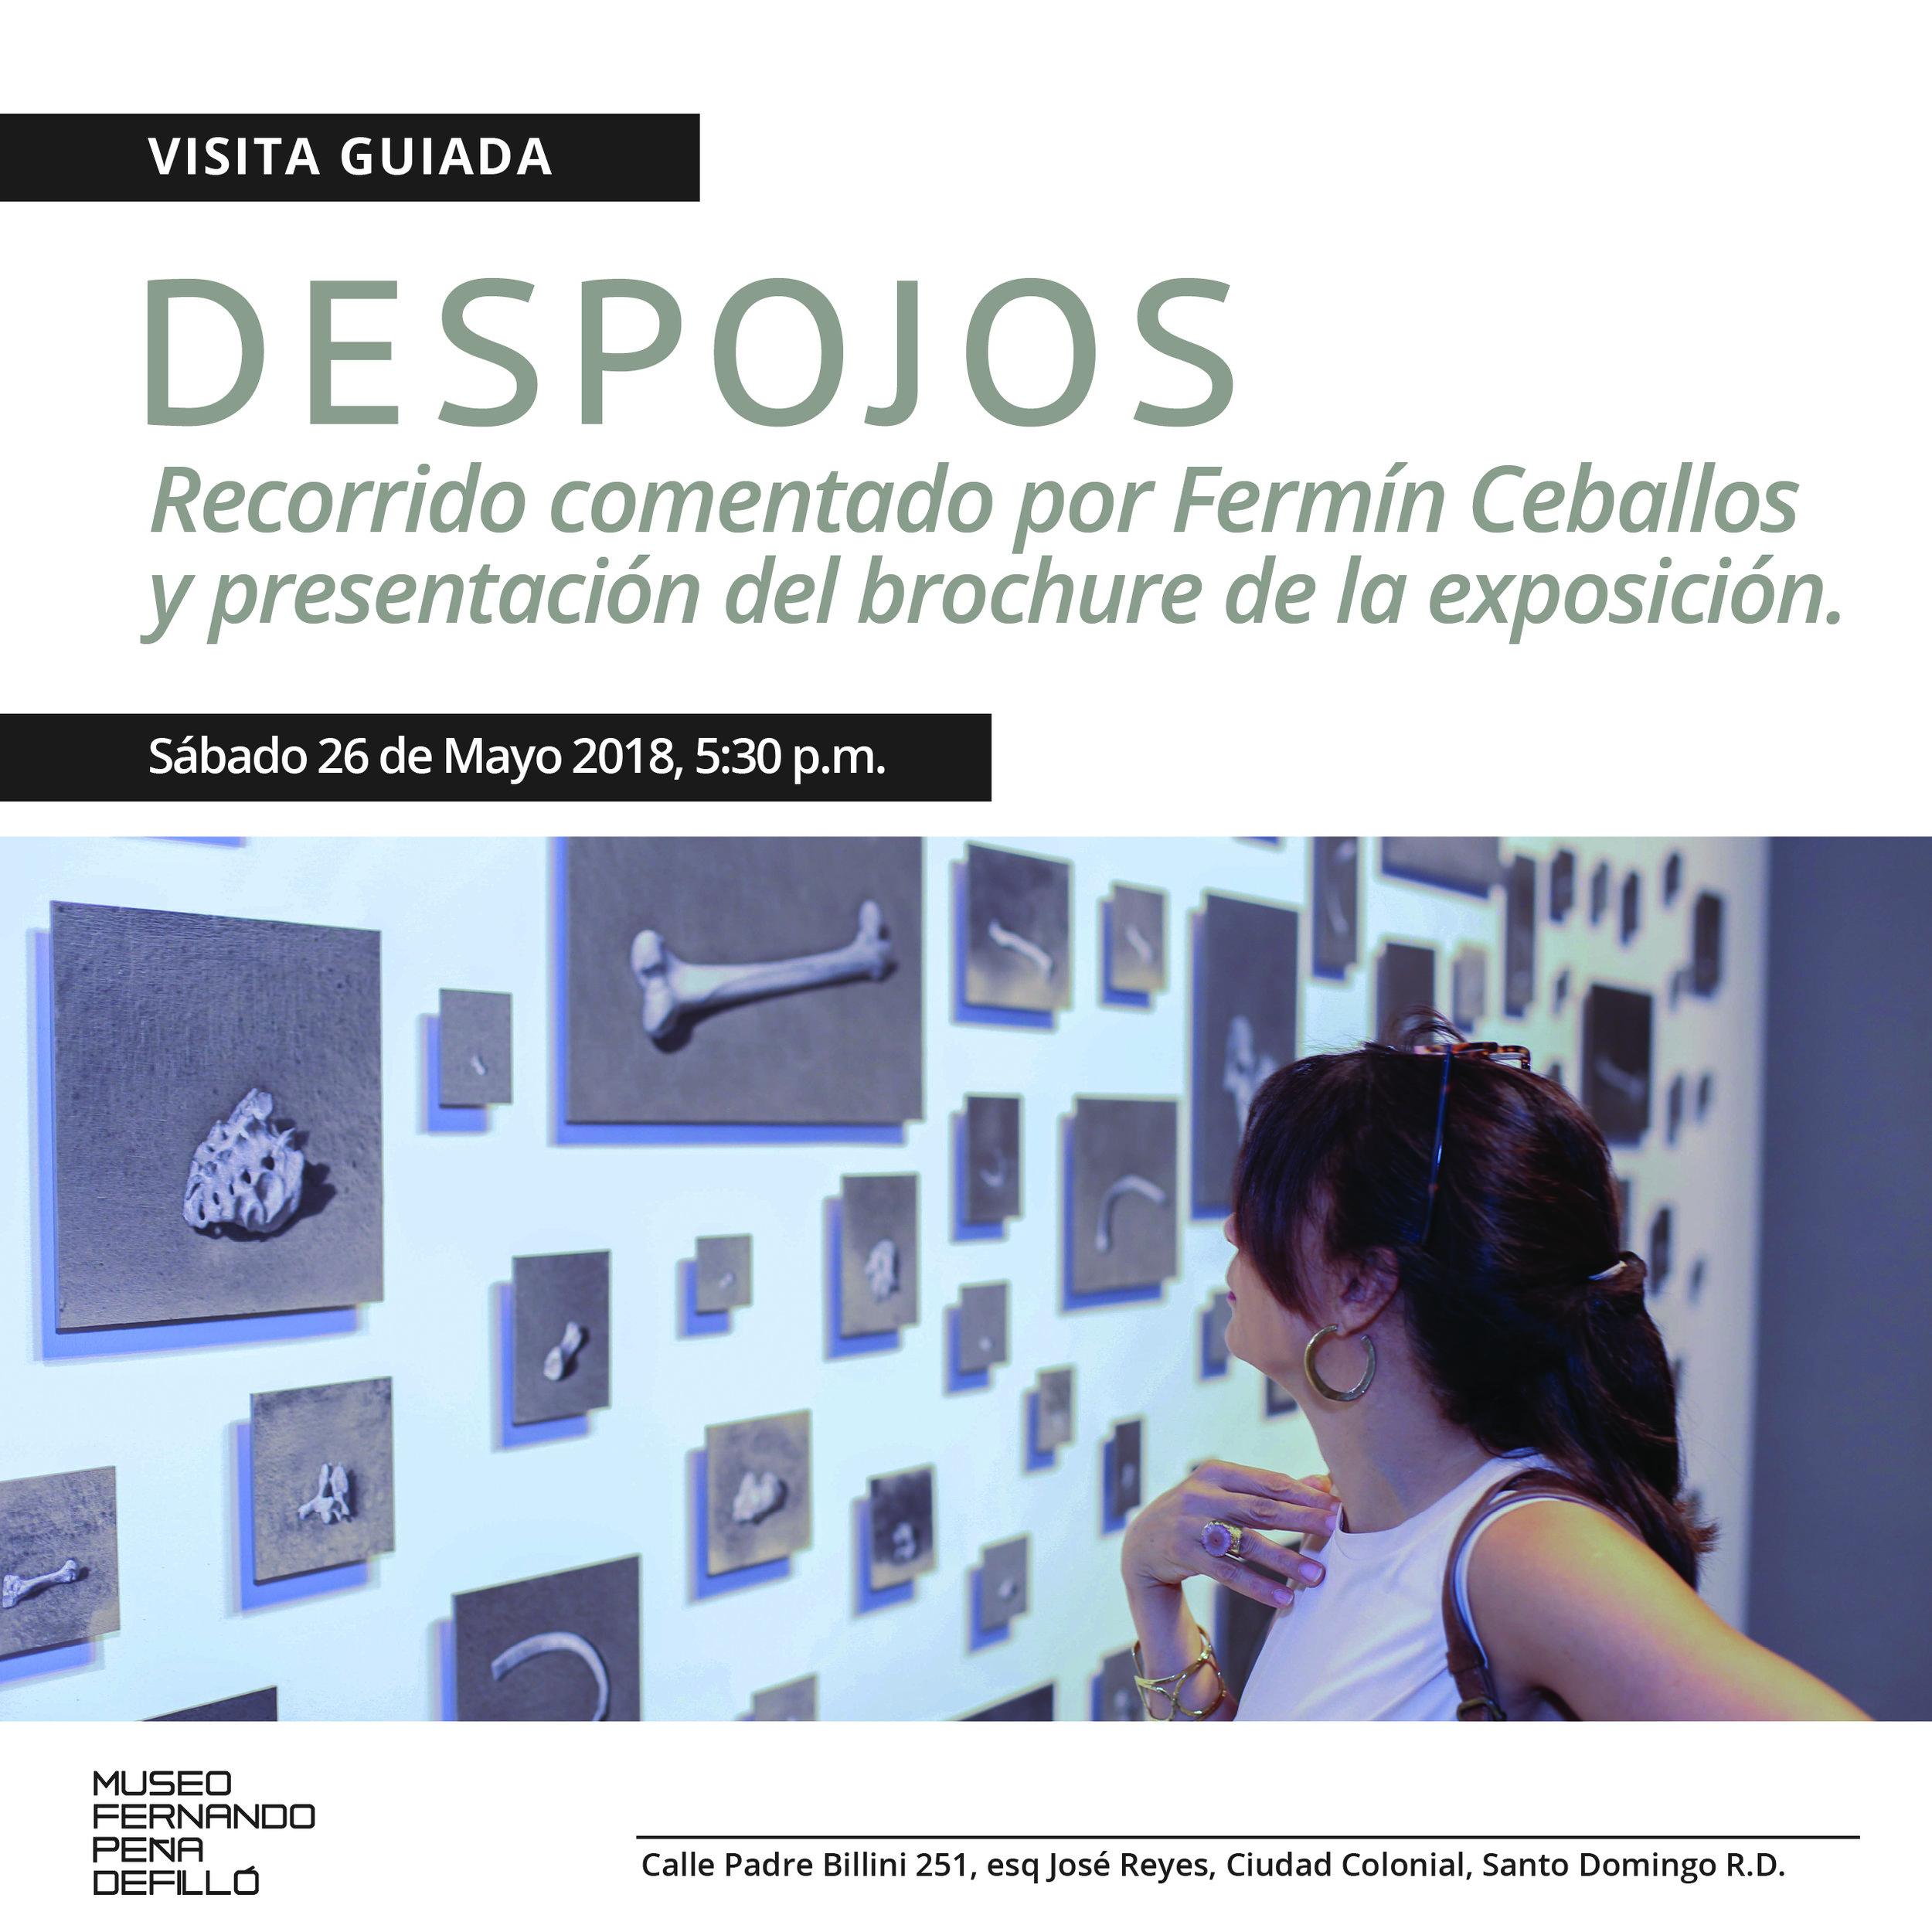 2018-05-26 Visita Guiada Despojos.jpg